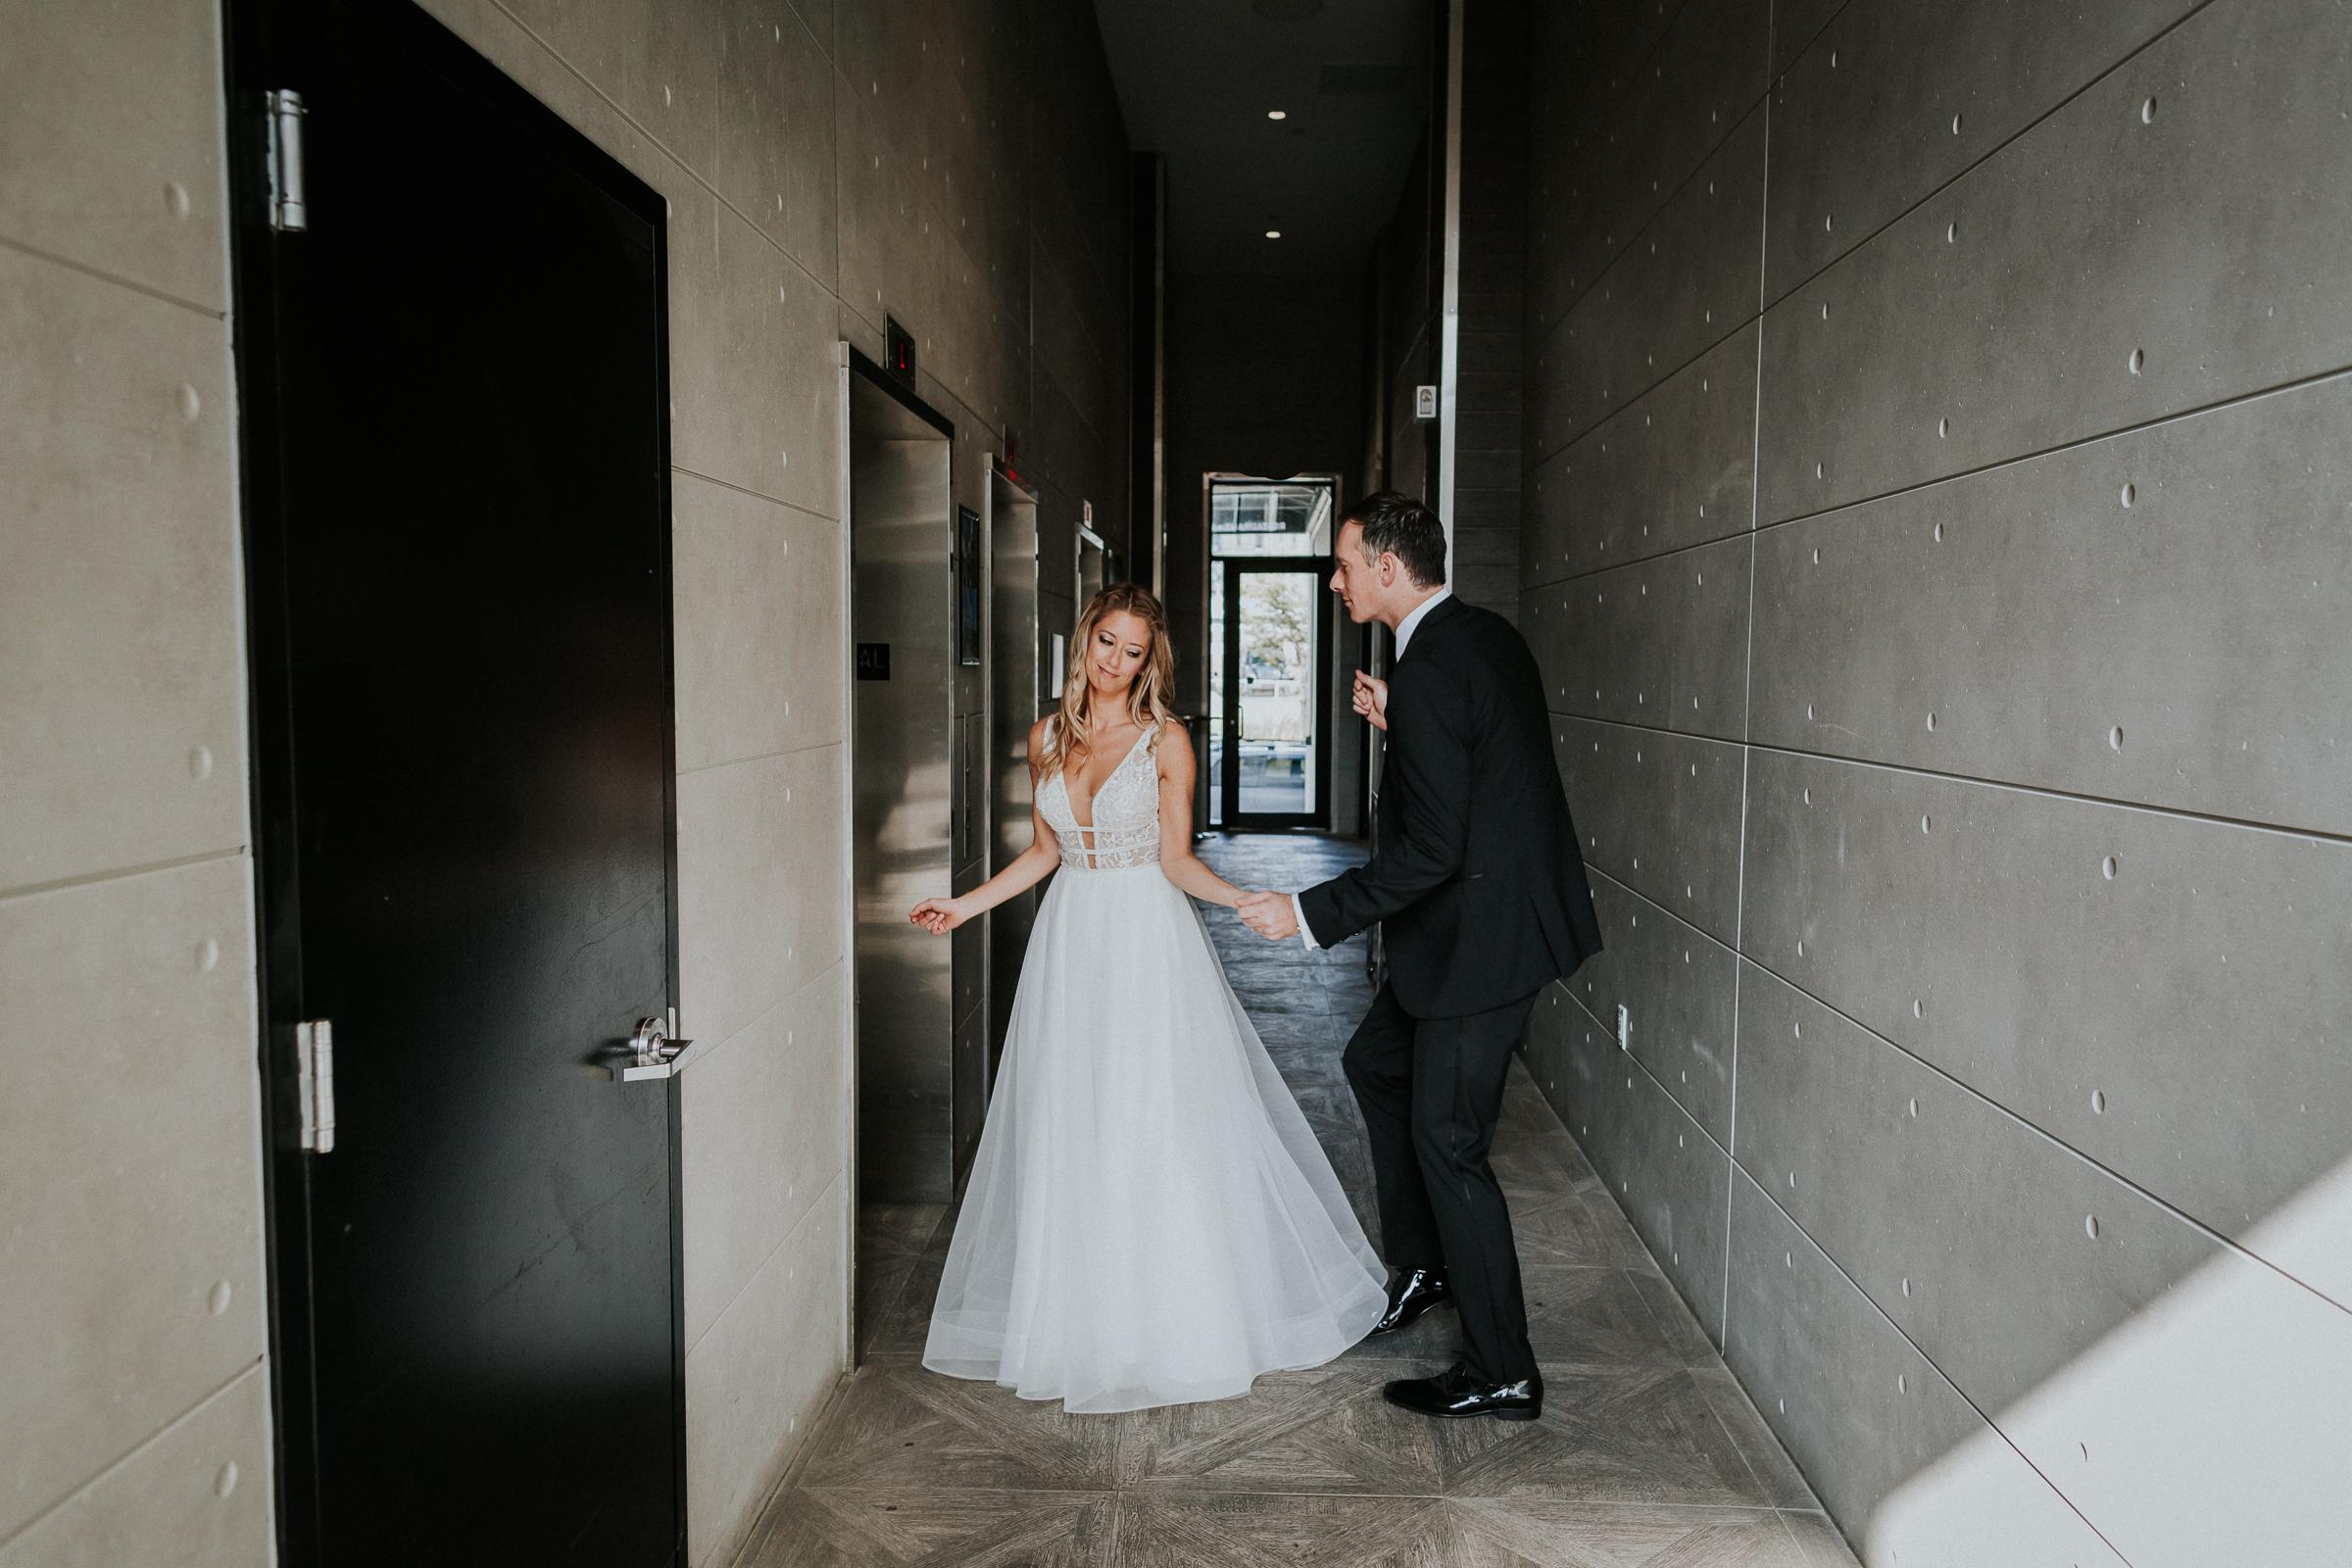 Ravel-Hotel-Penthouse-808-Long-Island-City-New-York-Documentary-Wedding-Photographer-30.jpg